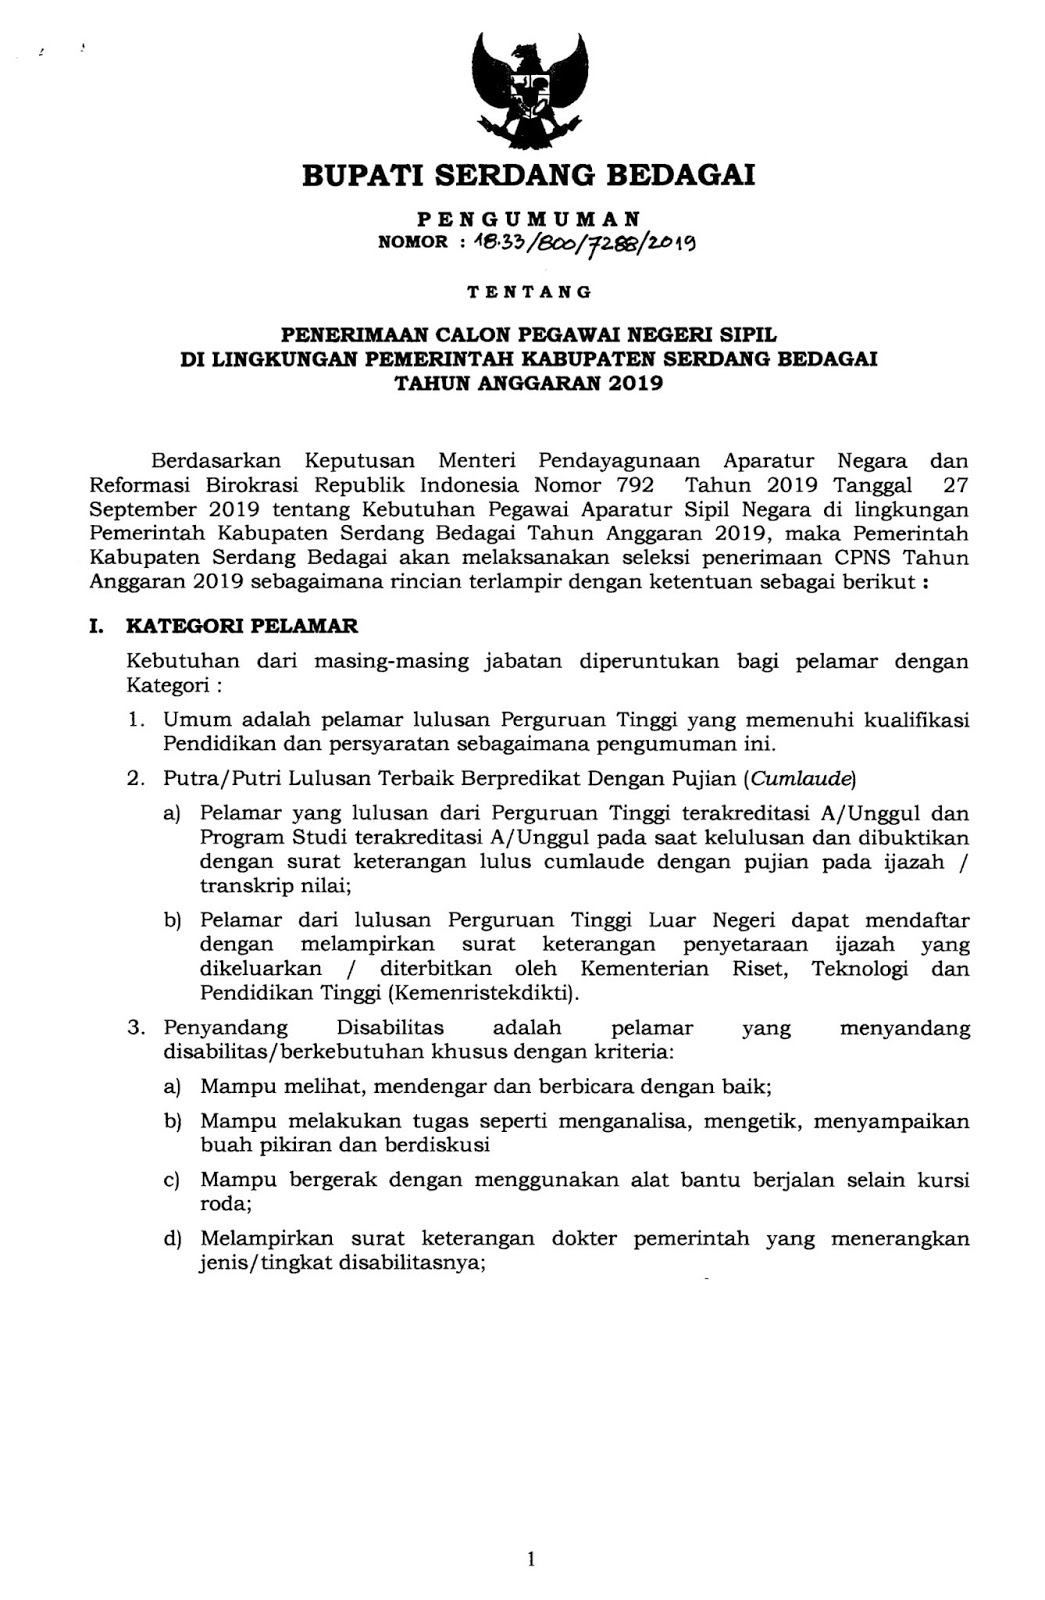 Lowongan CPNS Kabupaten Serdang Bedagai Tahun Anggaran 2019 [104 Formasi]